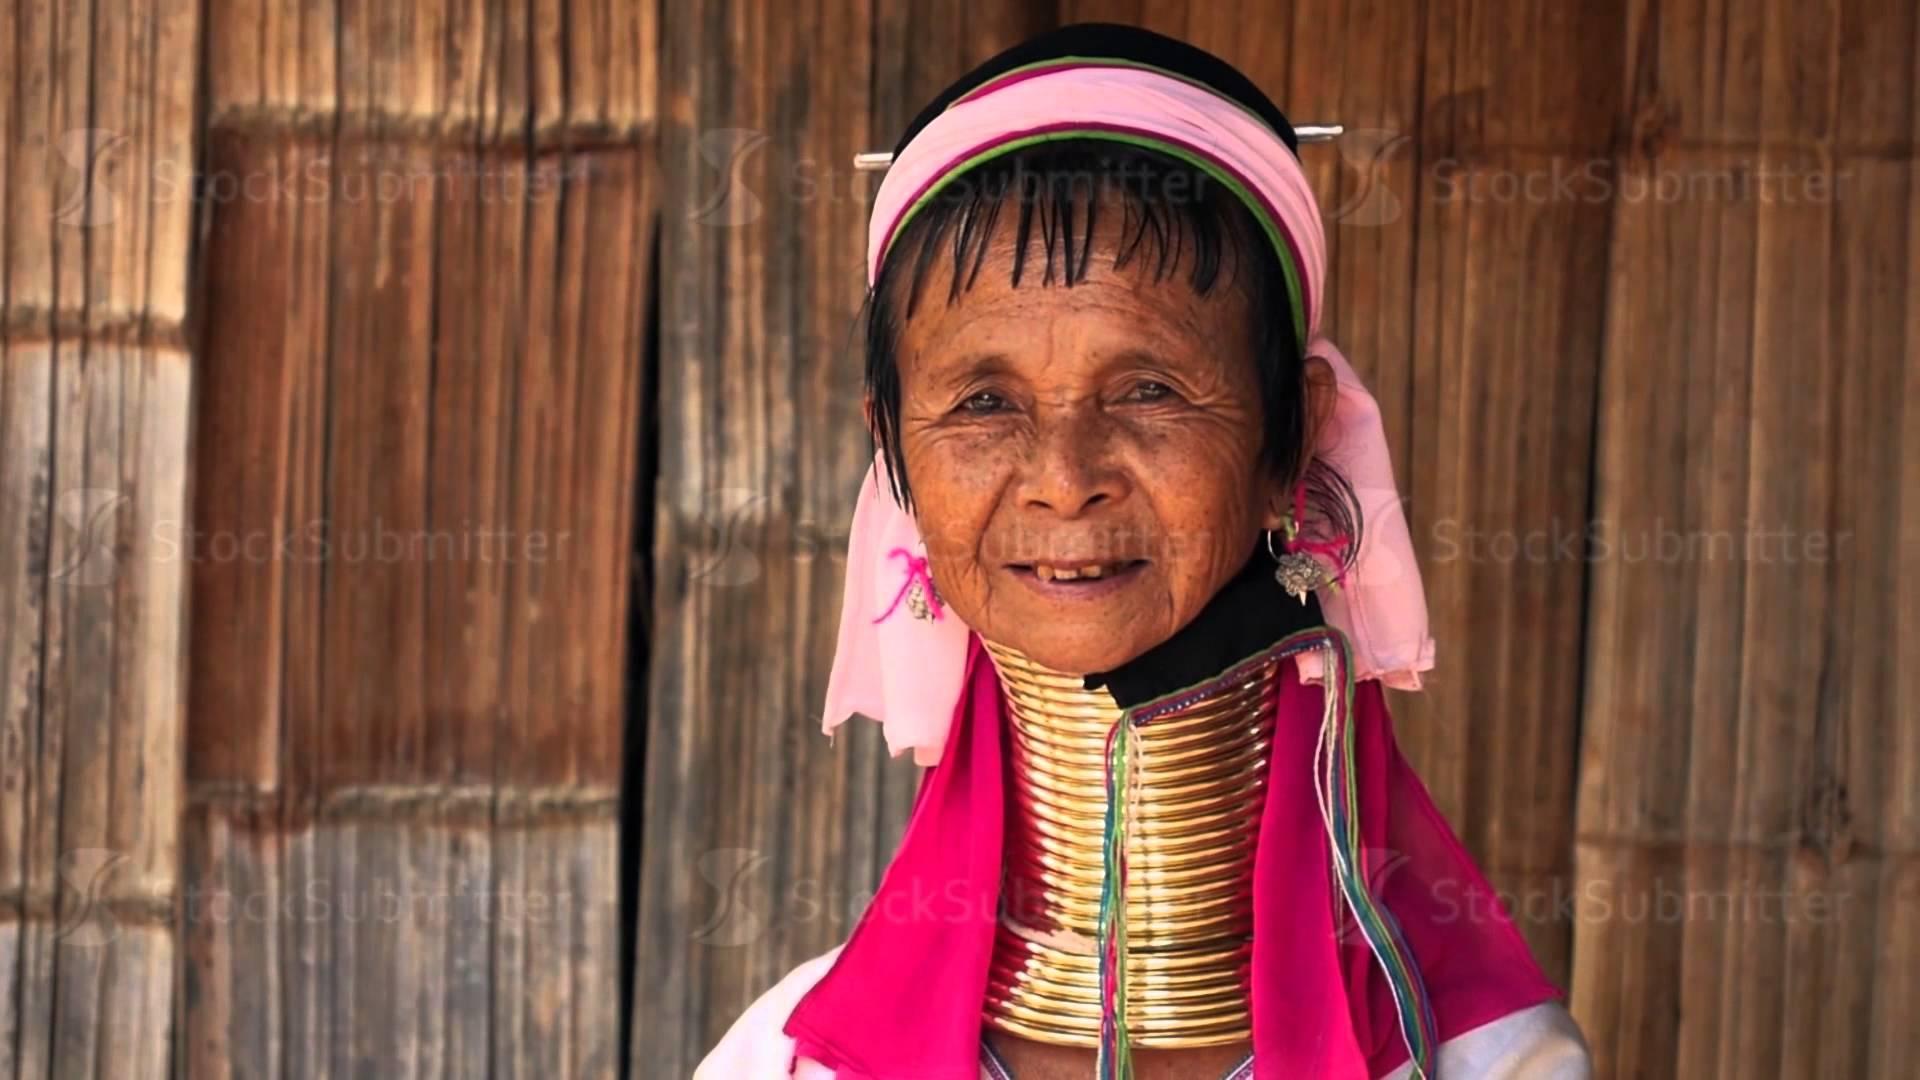 Karen Tribal Woman in Long Neck Hill Tribe Village - YouTube